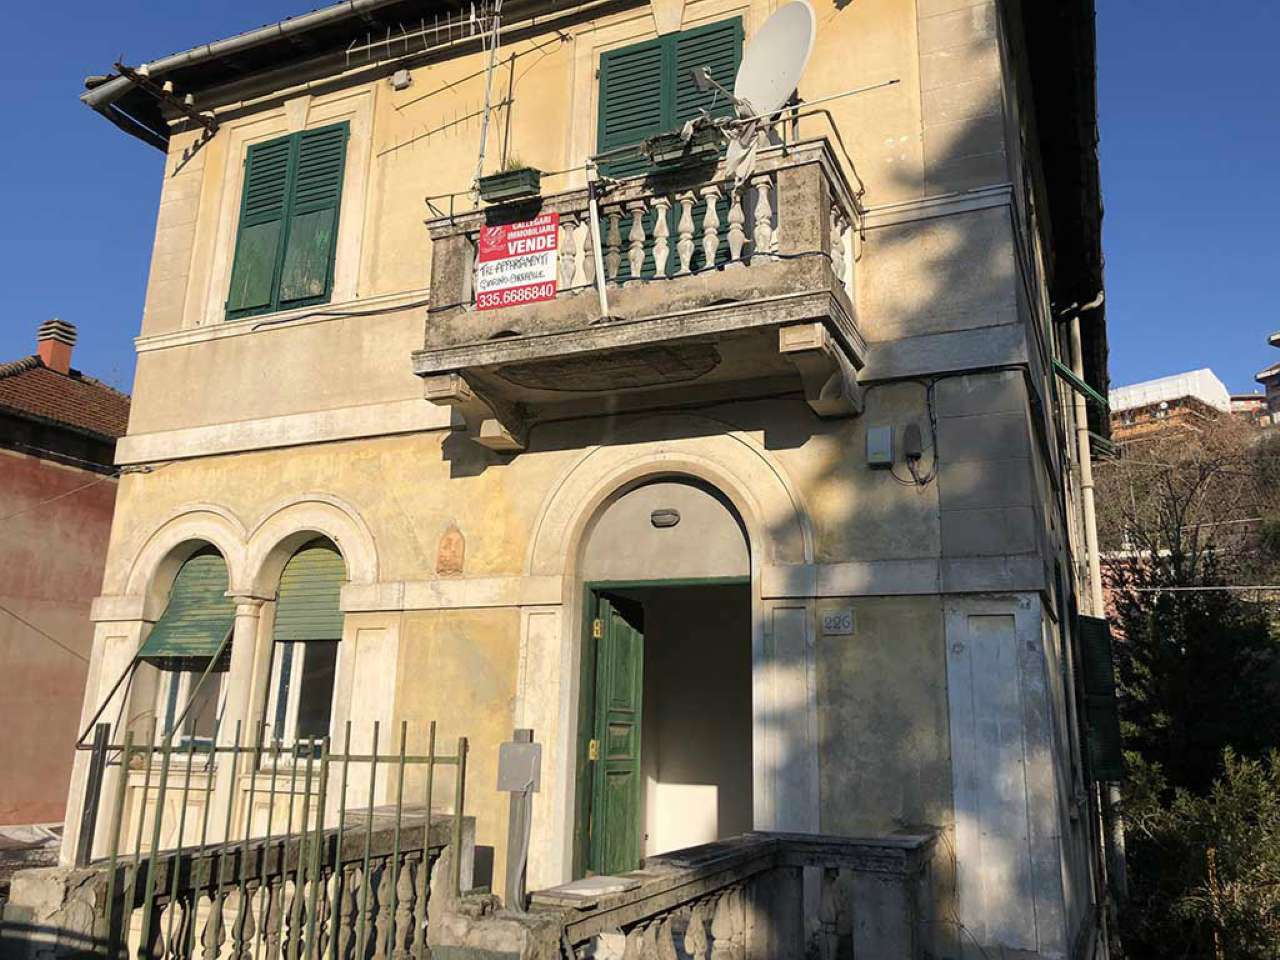 Foto 1 di Palazzo / Stabile via STRUPPA 226, Genova (zona Valbisagno (Prato-Molassana-Struppa-S.Gottardo-S.Eusebio))